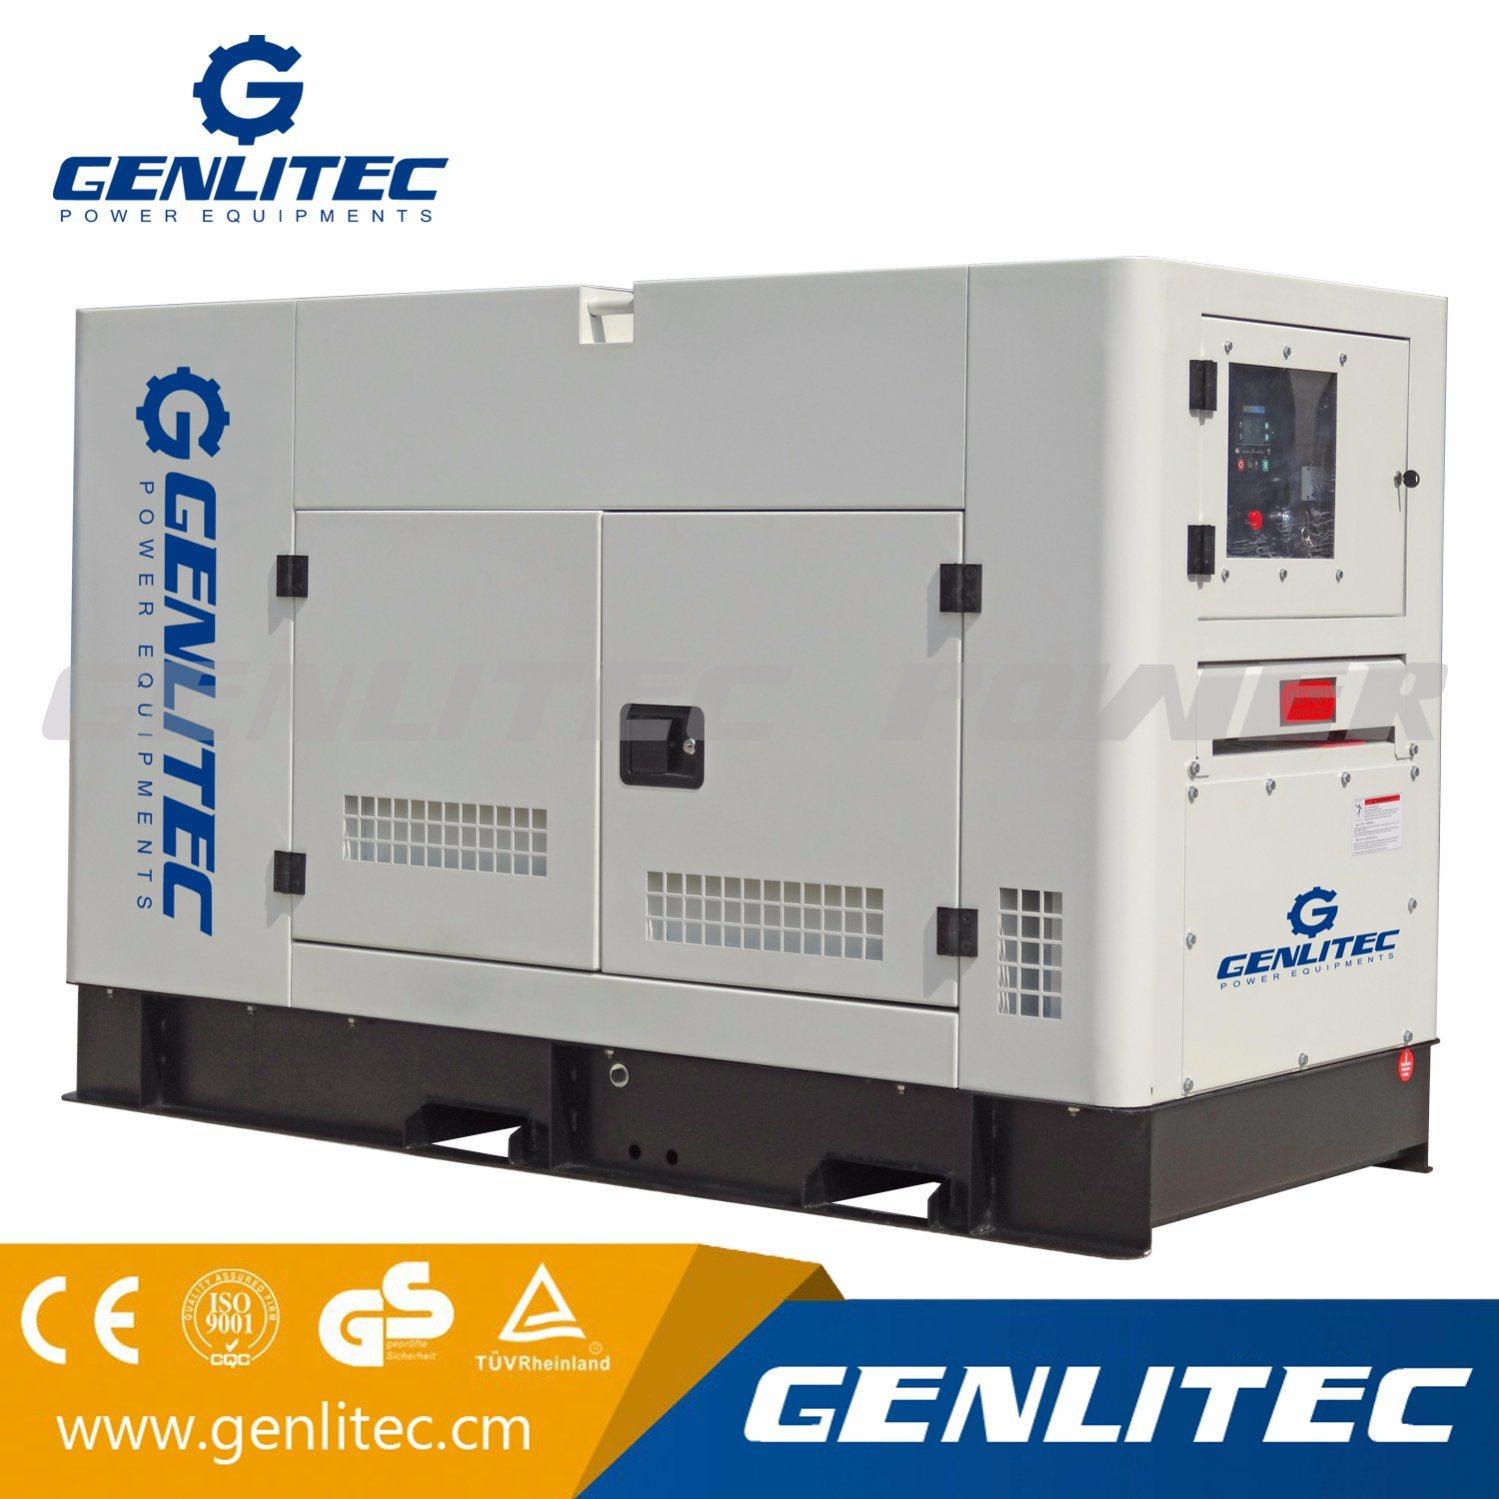 GCC Series CHANGCHAI Genlitec Fuzhou Power Equipment Co